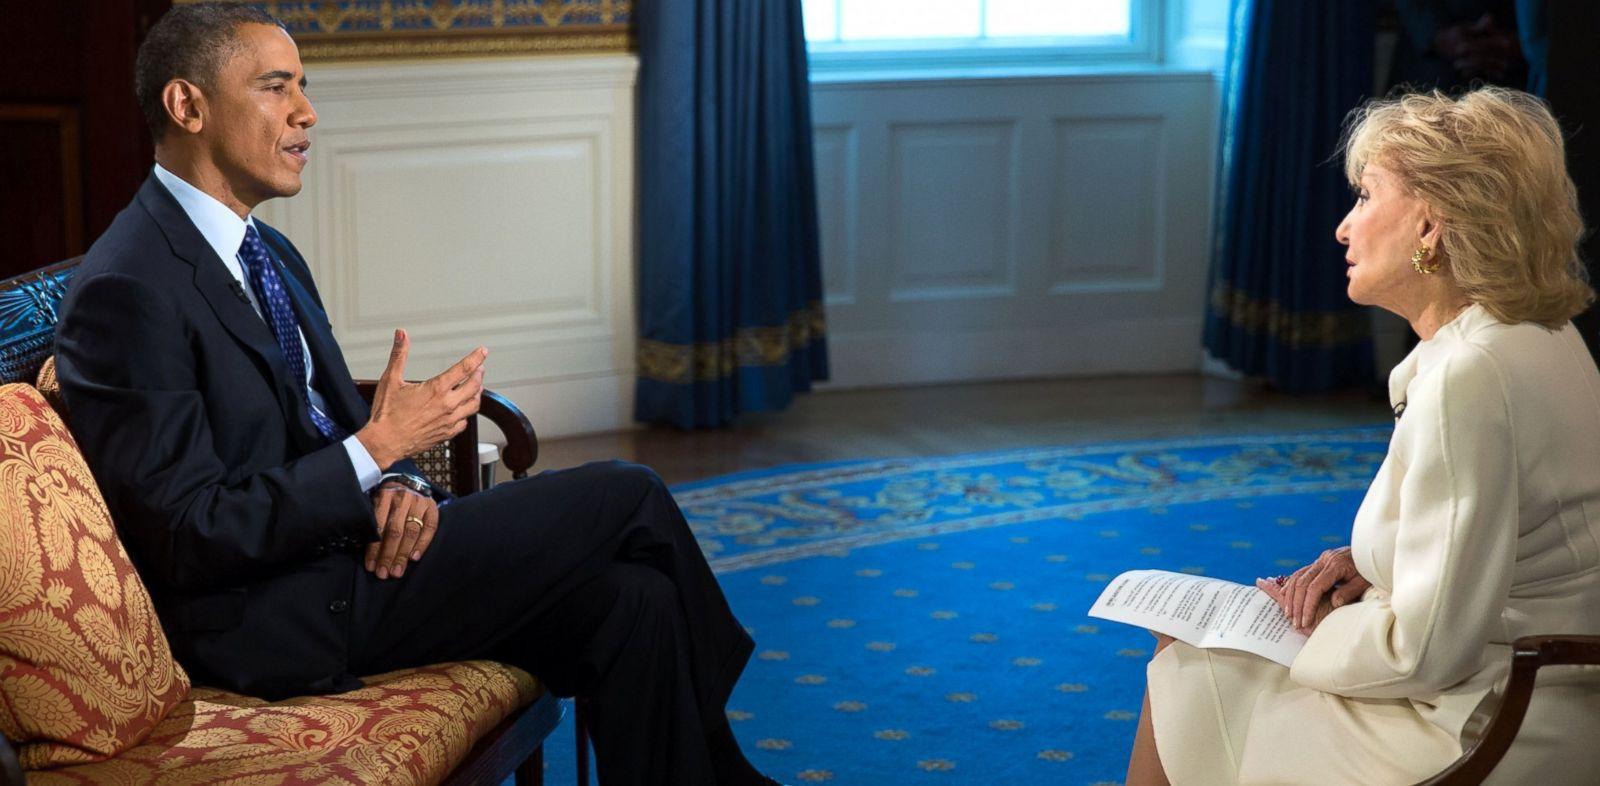 PHOTO: President Obama speaks to ABC News Barbara Walters at the White House on Nov. 22, 2013.